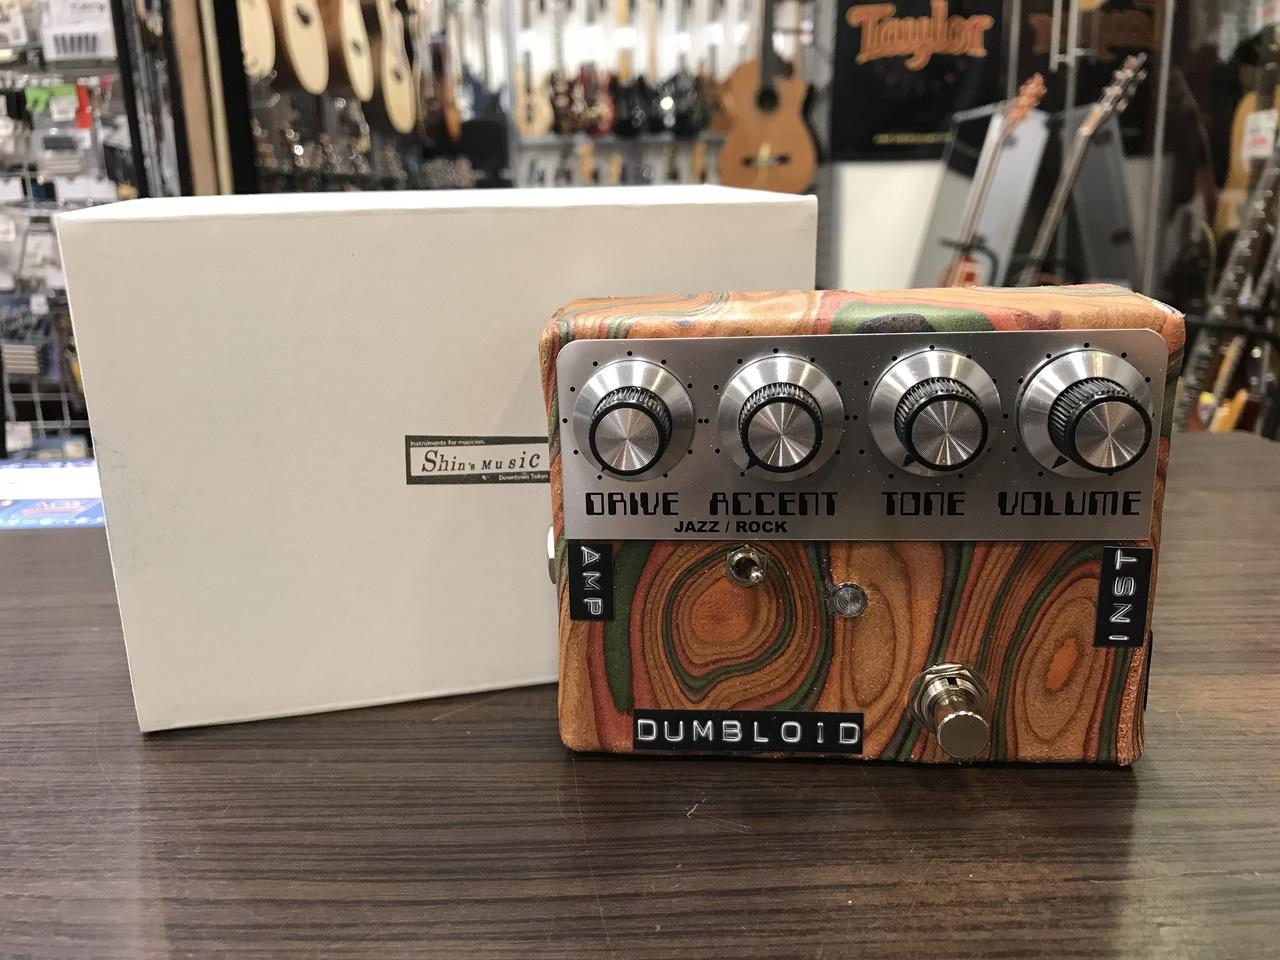 Shin's Music Dumbloid Special w/Jazz Rock SW Sukimo Leather #1243 【展示入替特価】【NAMN 2018モデル】